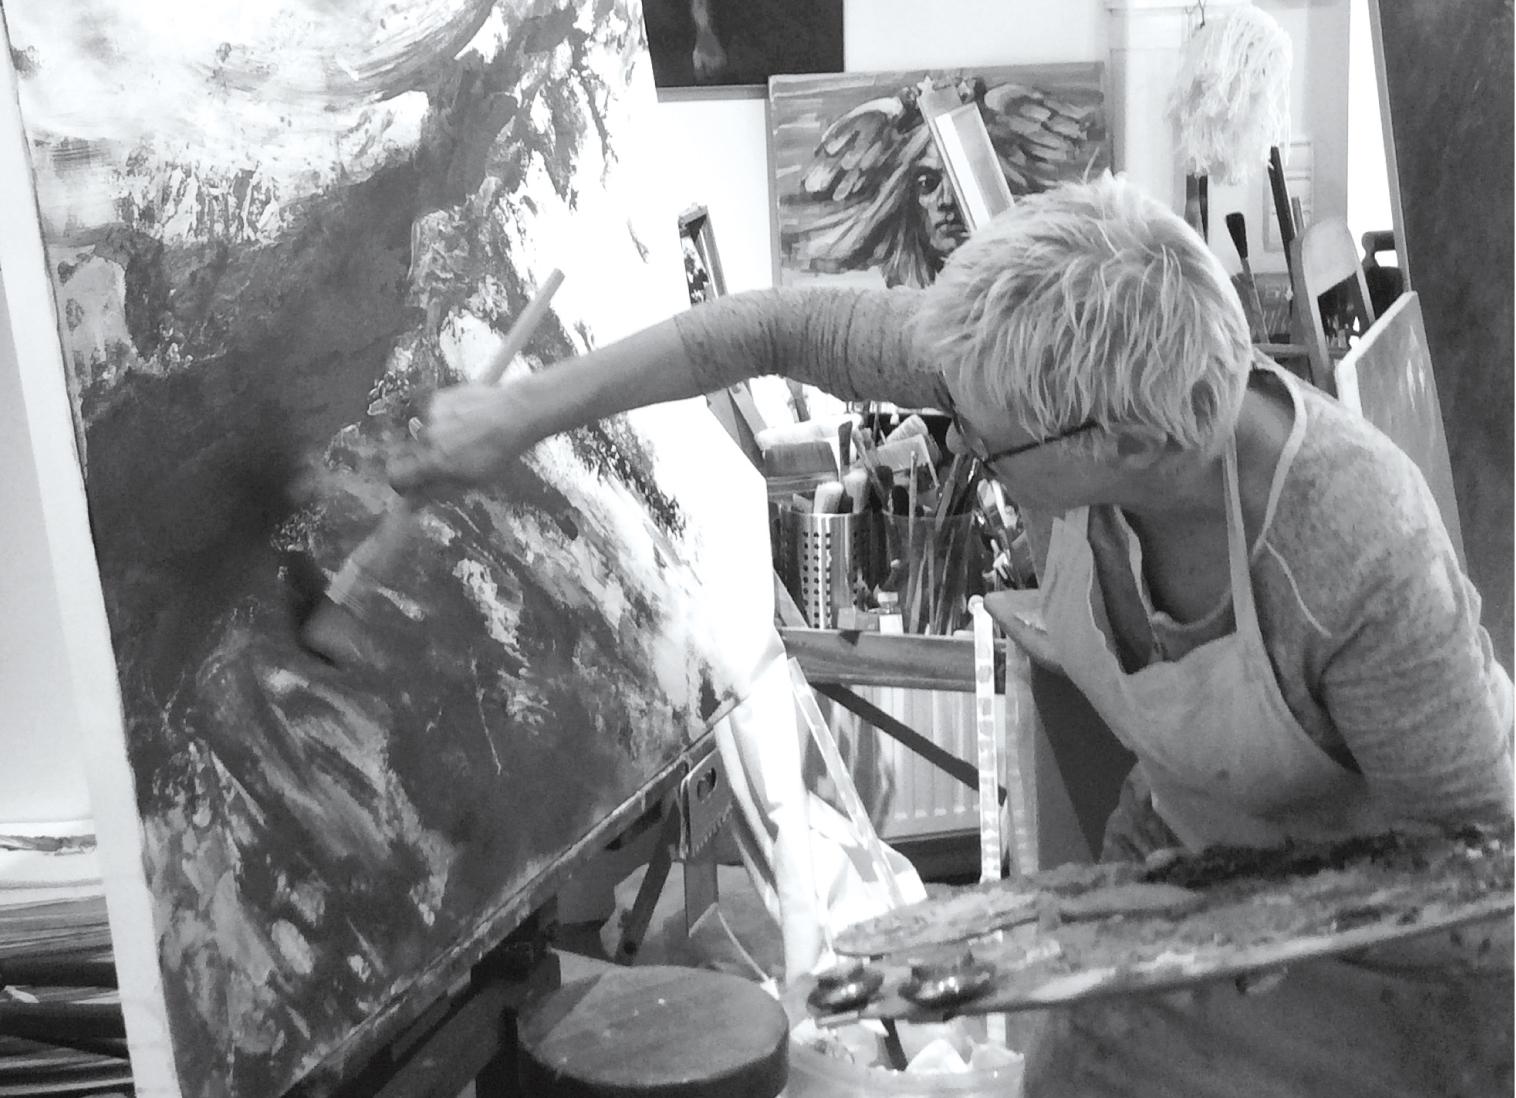 Artiste Marie-Pierre Maurer